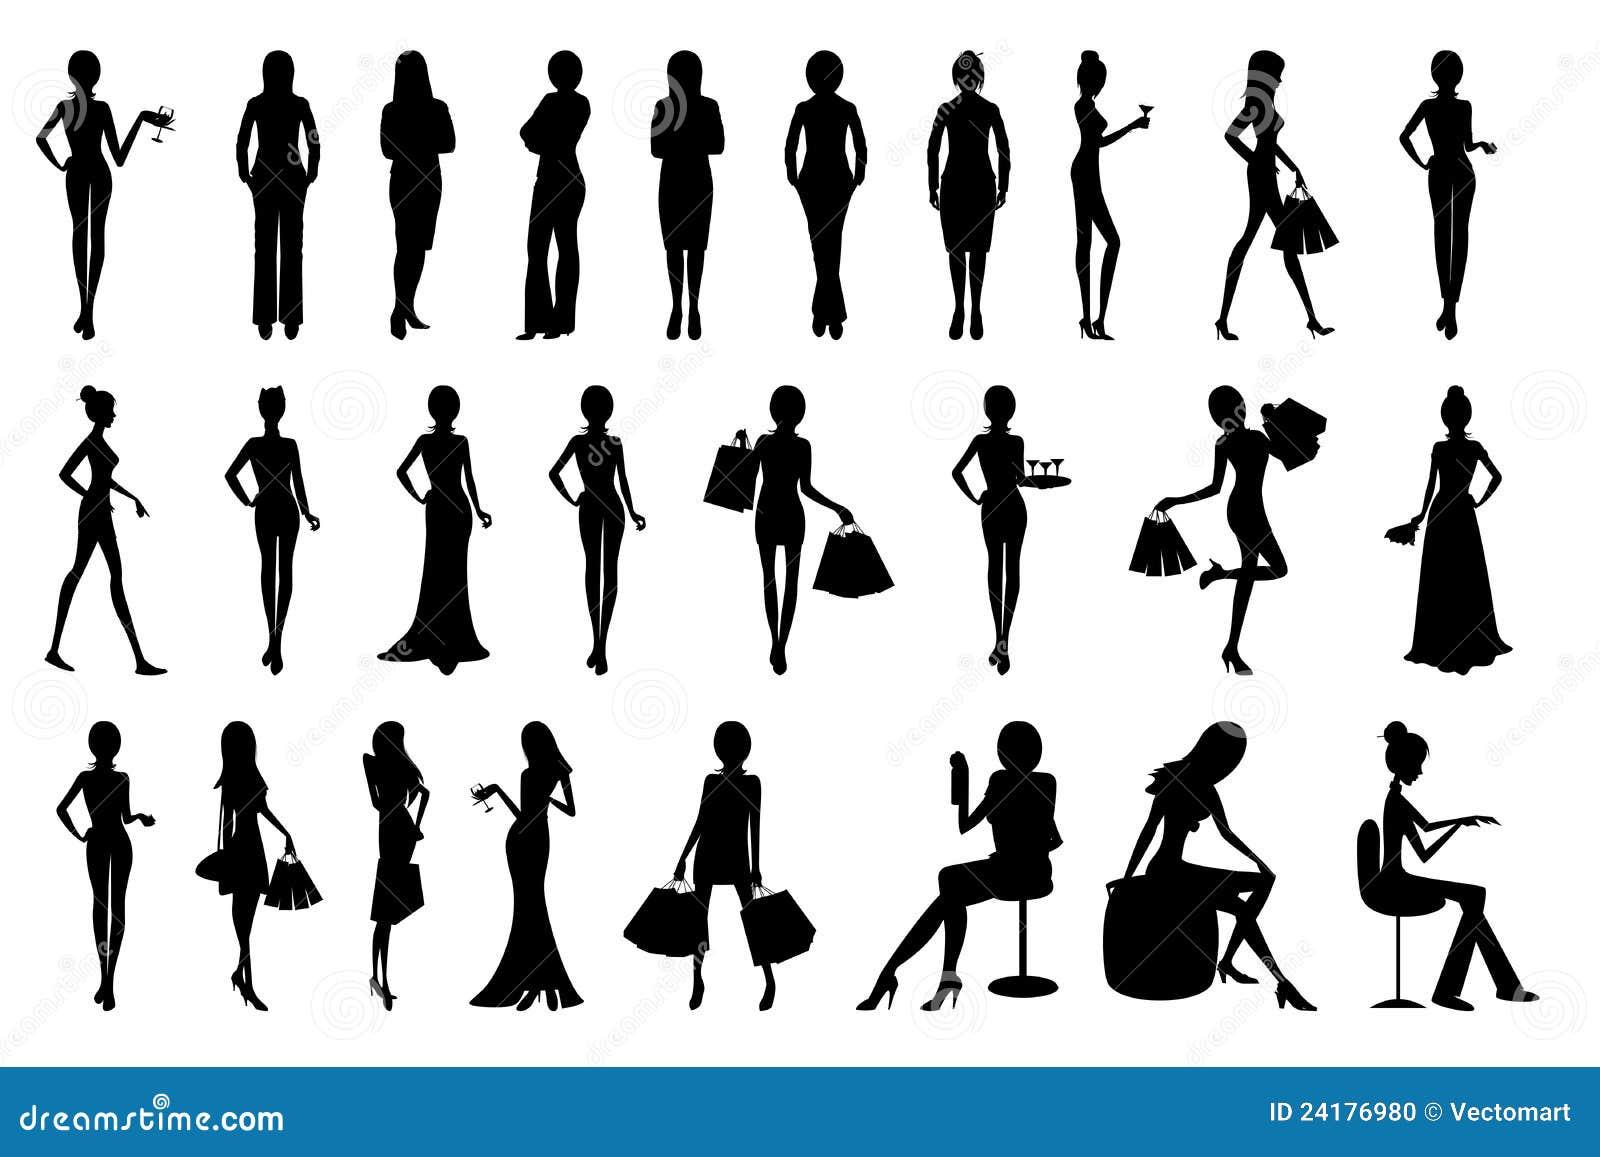 Женский силуэт картинки 162